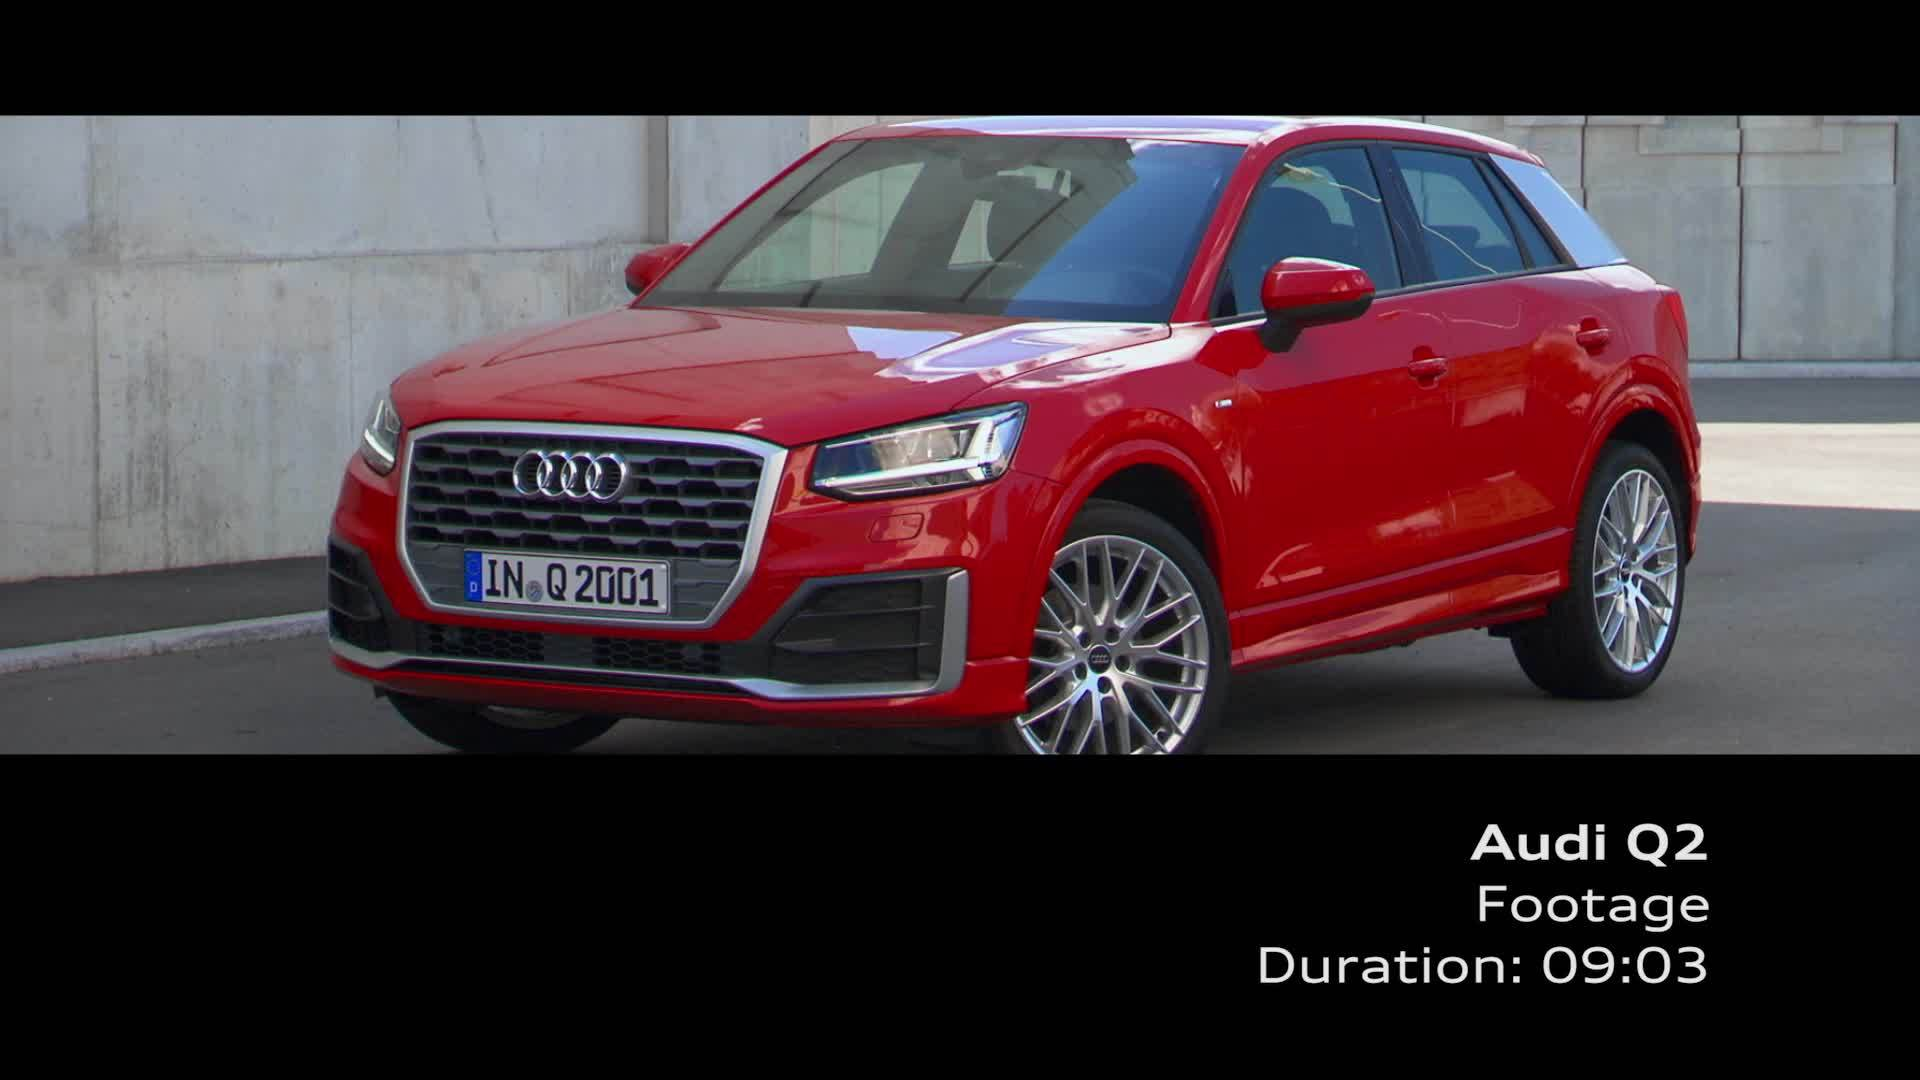 Audi Q2 - Footage on Location, Tango Red